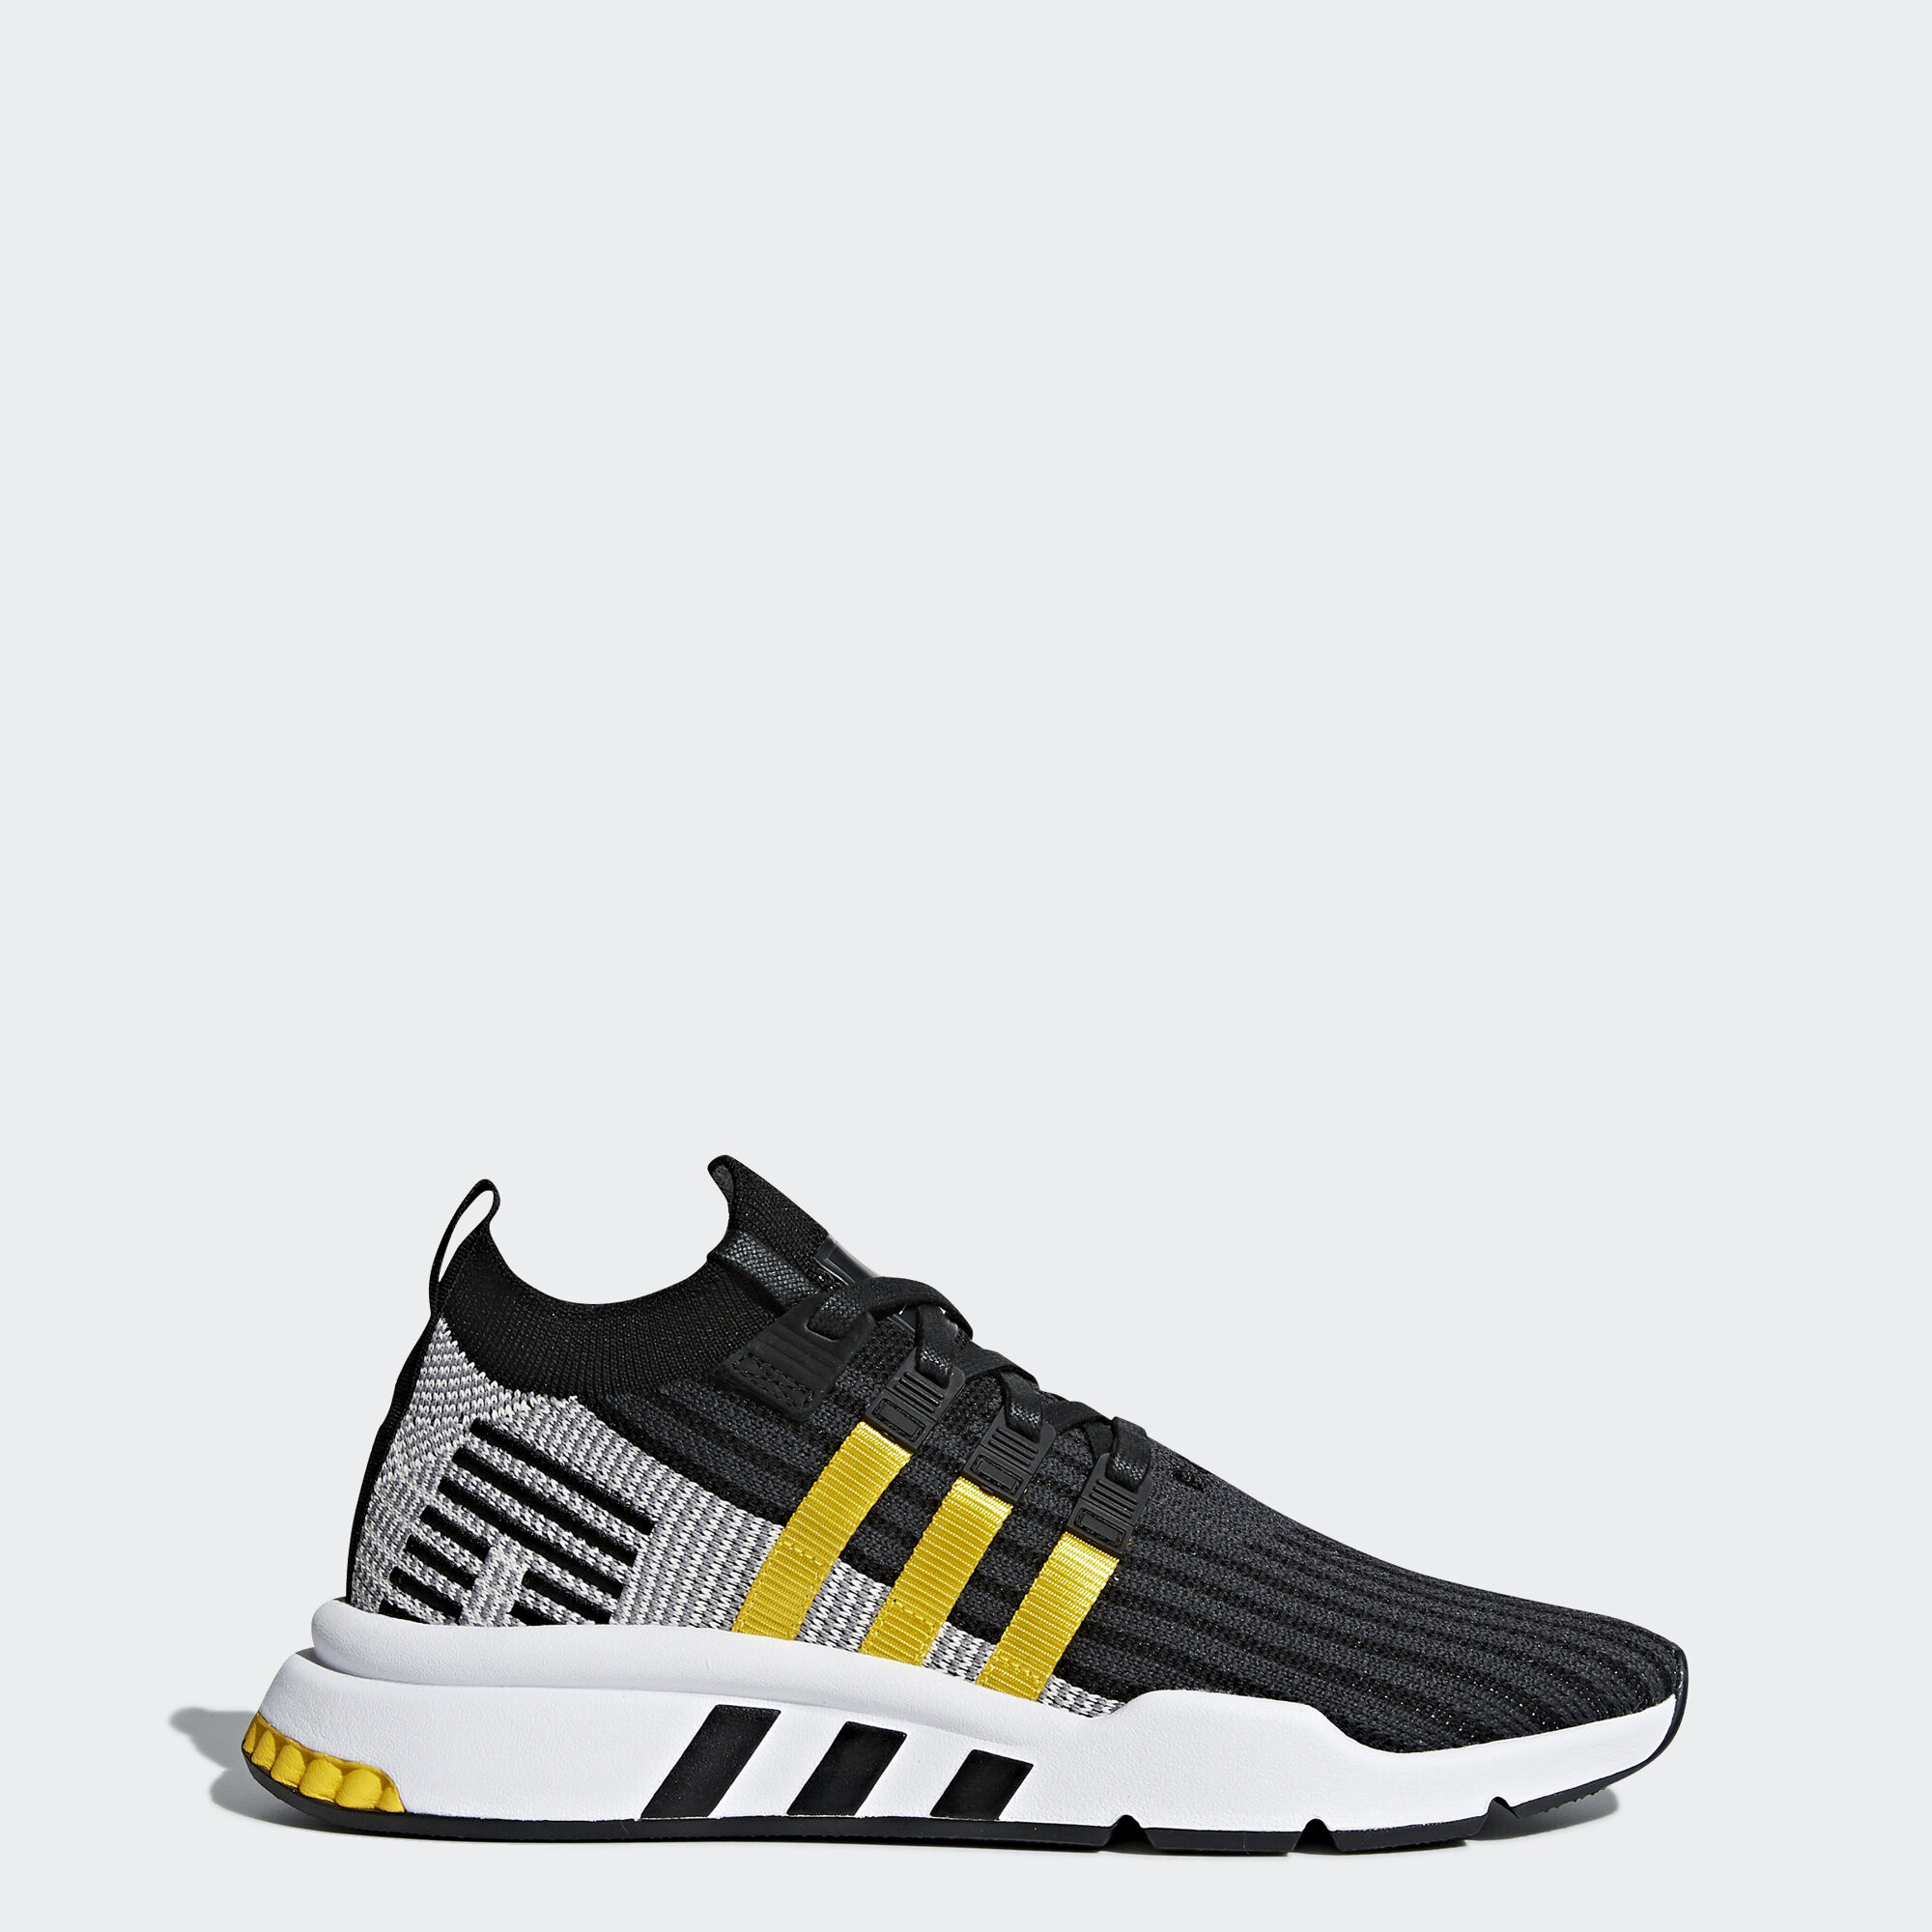 quality design b36d4 f1ead ... closeout eqt support mid adv primeknit shoes 4bb0c c05e4